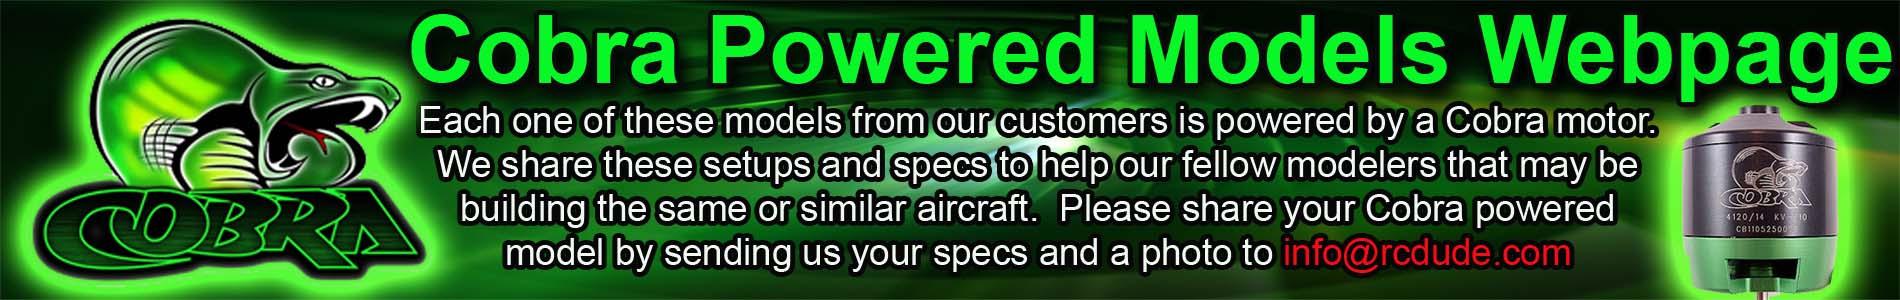 Cobra Powered Models Webpage